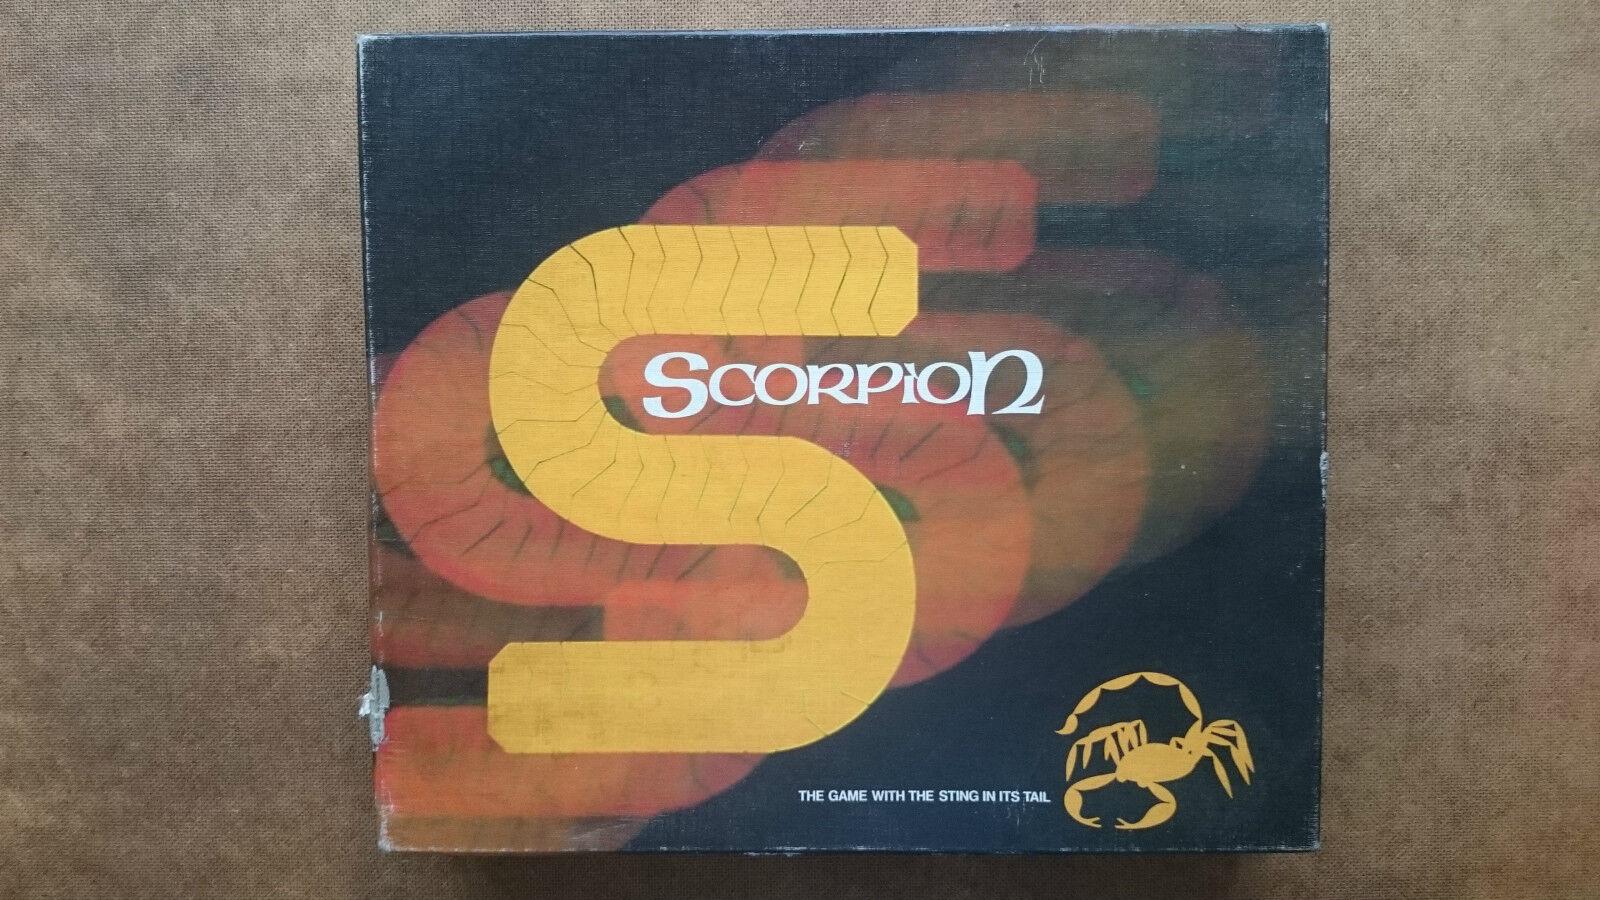 Scorpion  By Spears 1983